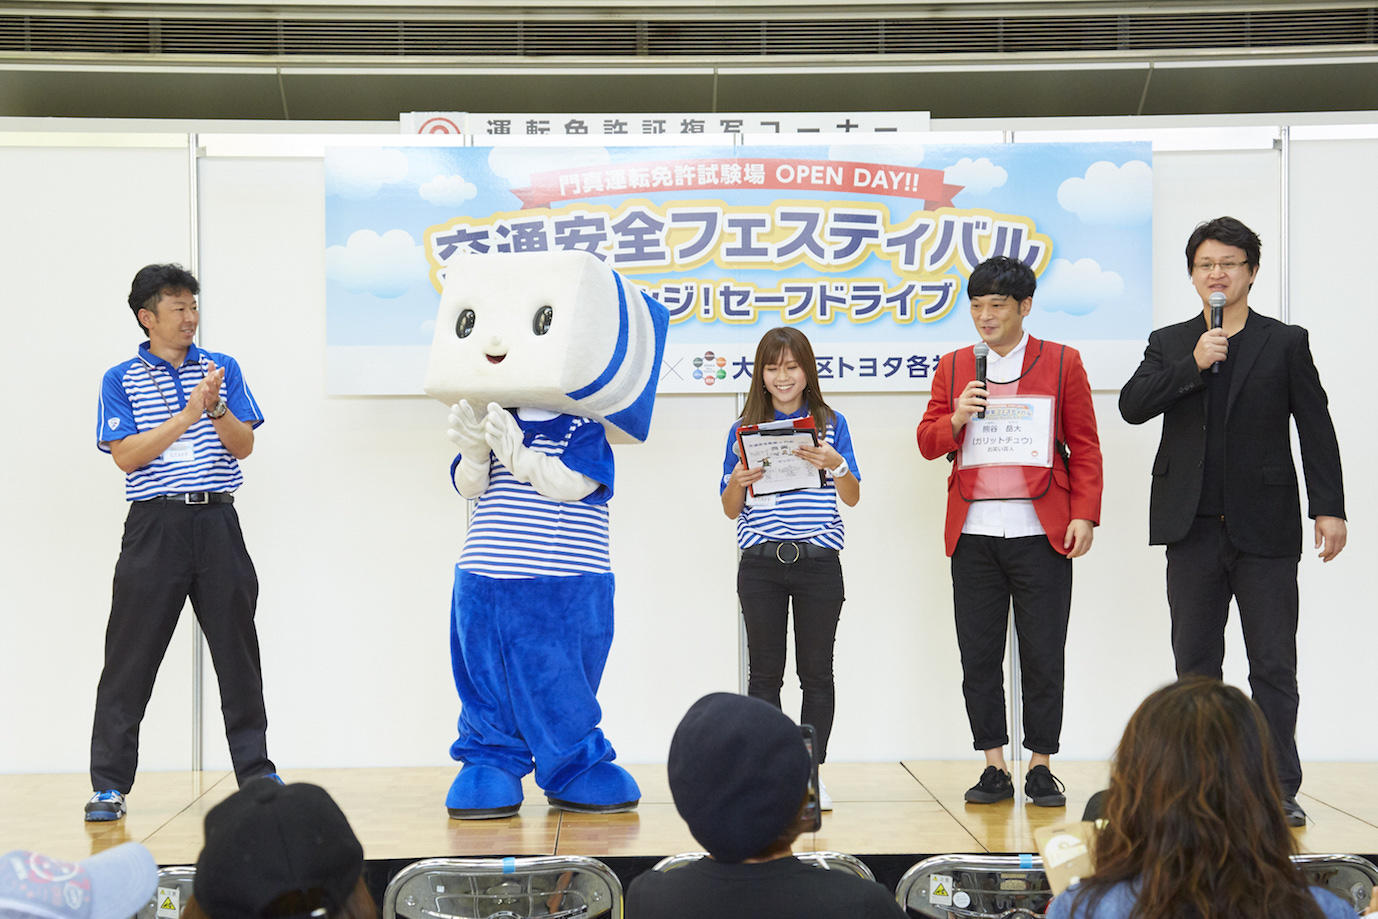 http://news.yoshimoto.co.jp/20181012090033-9951ff38cef3cafb37f102d2f768bfb16e0440ab.jpg